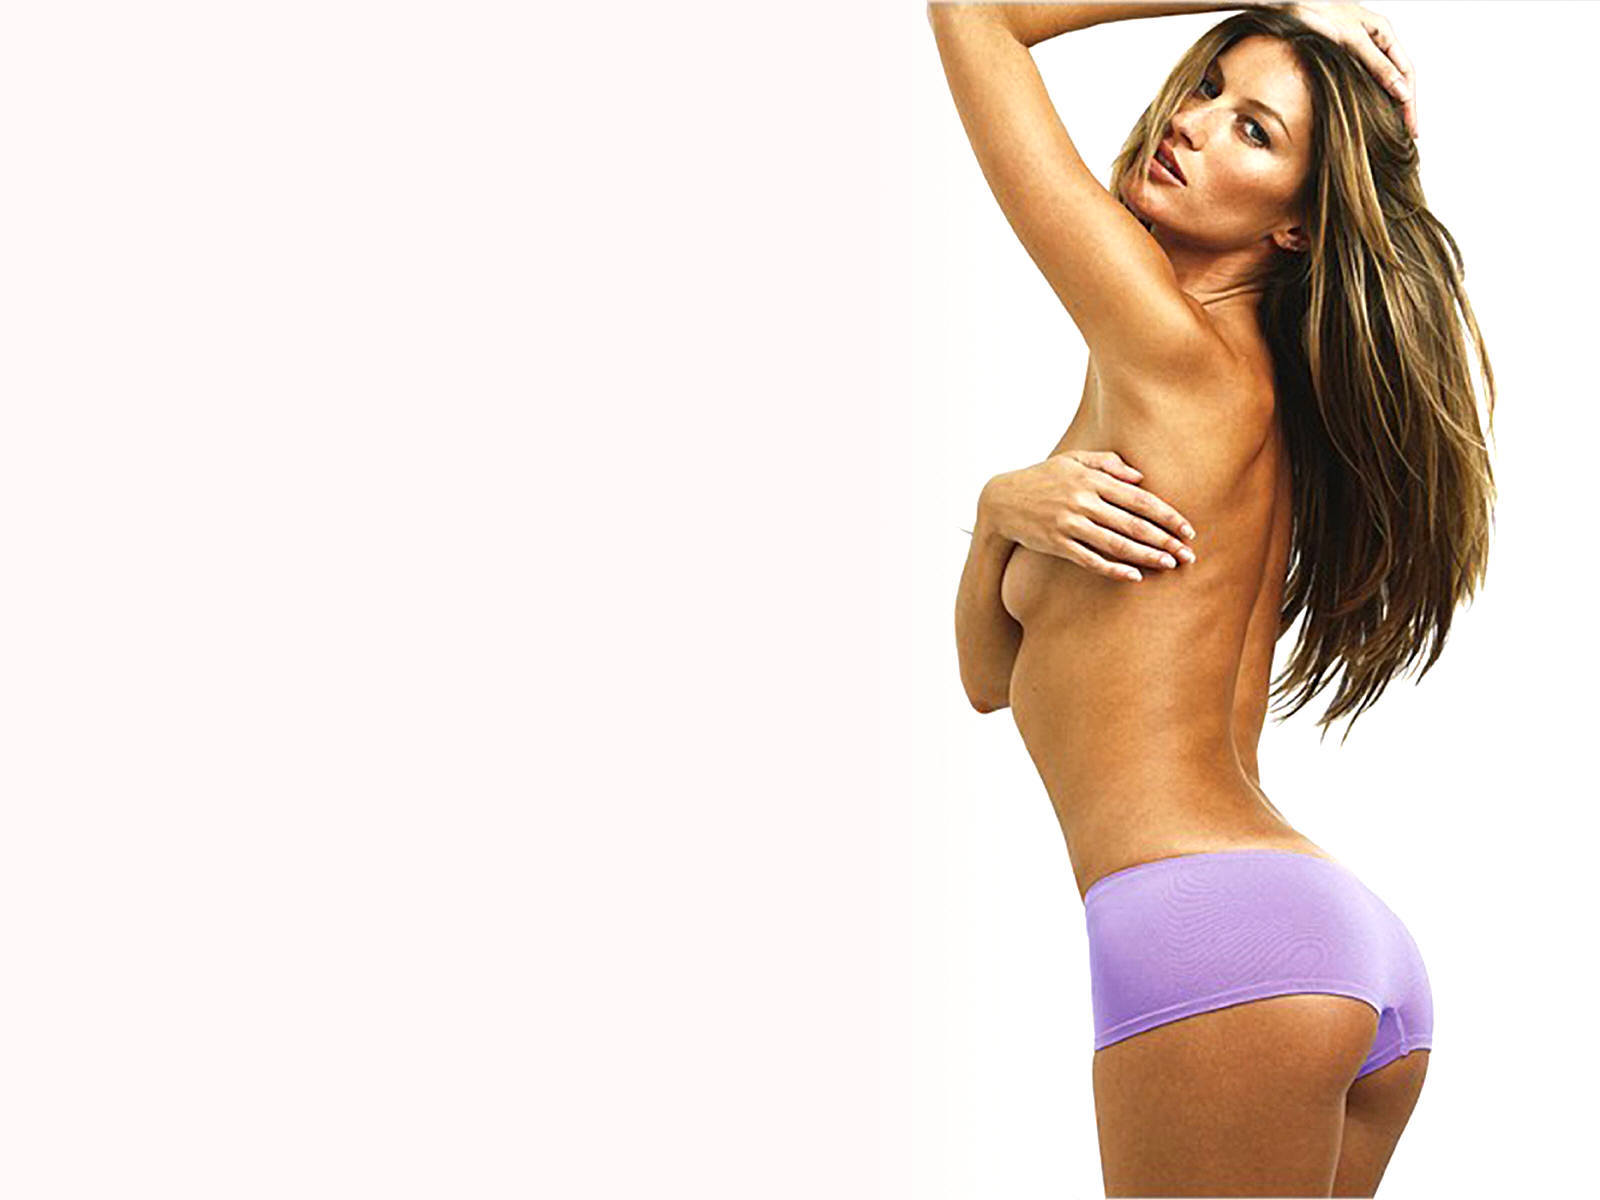 Gisele Bundchen Sexy Wallpapers